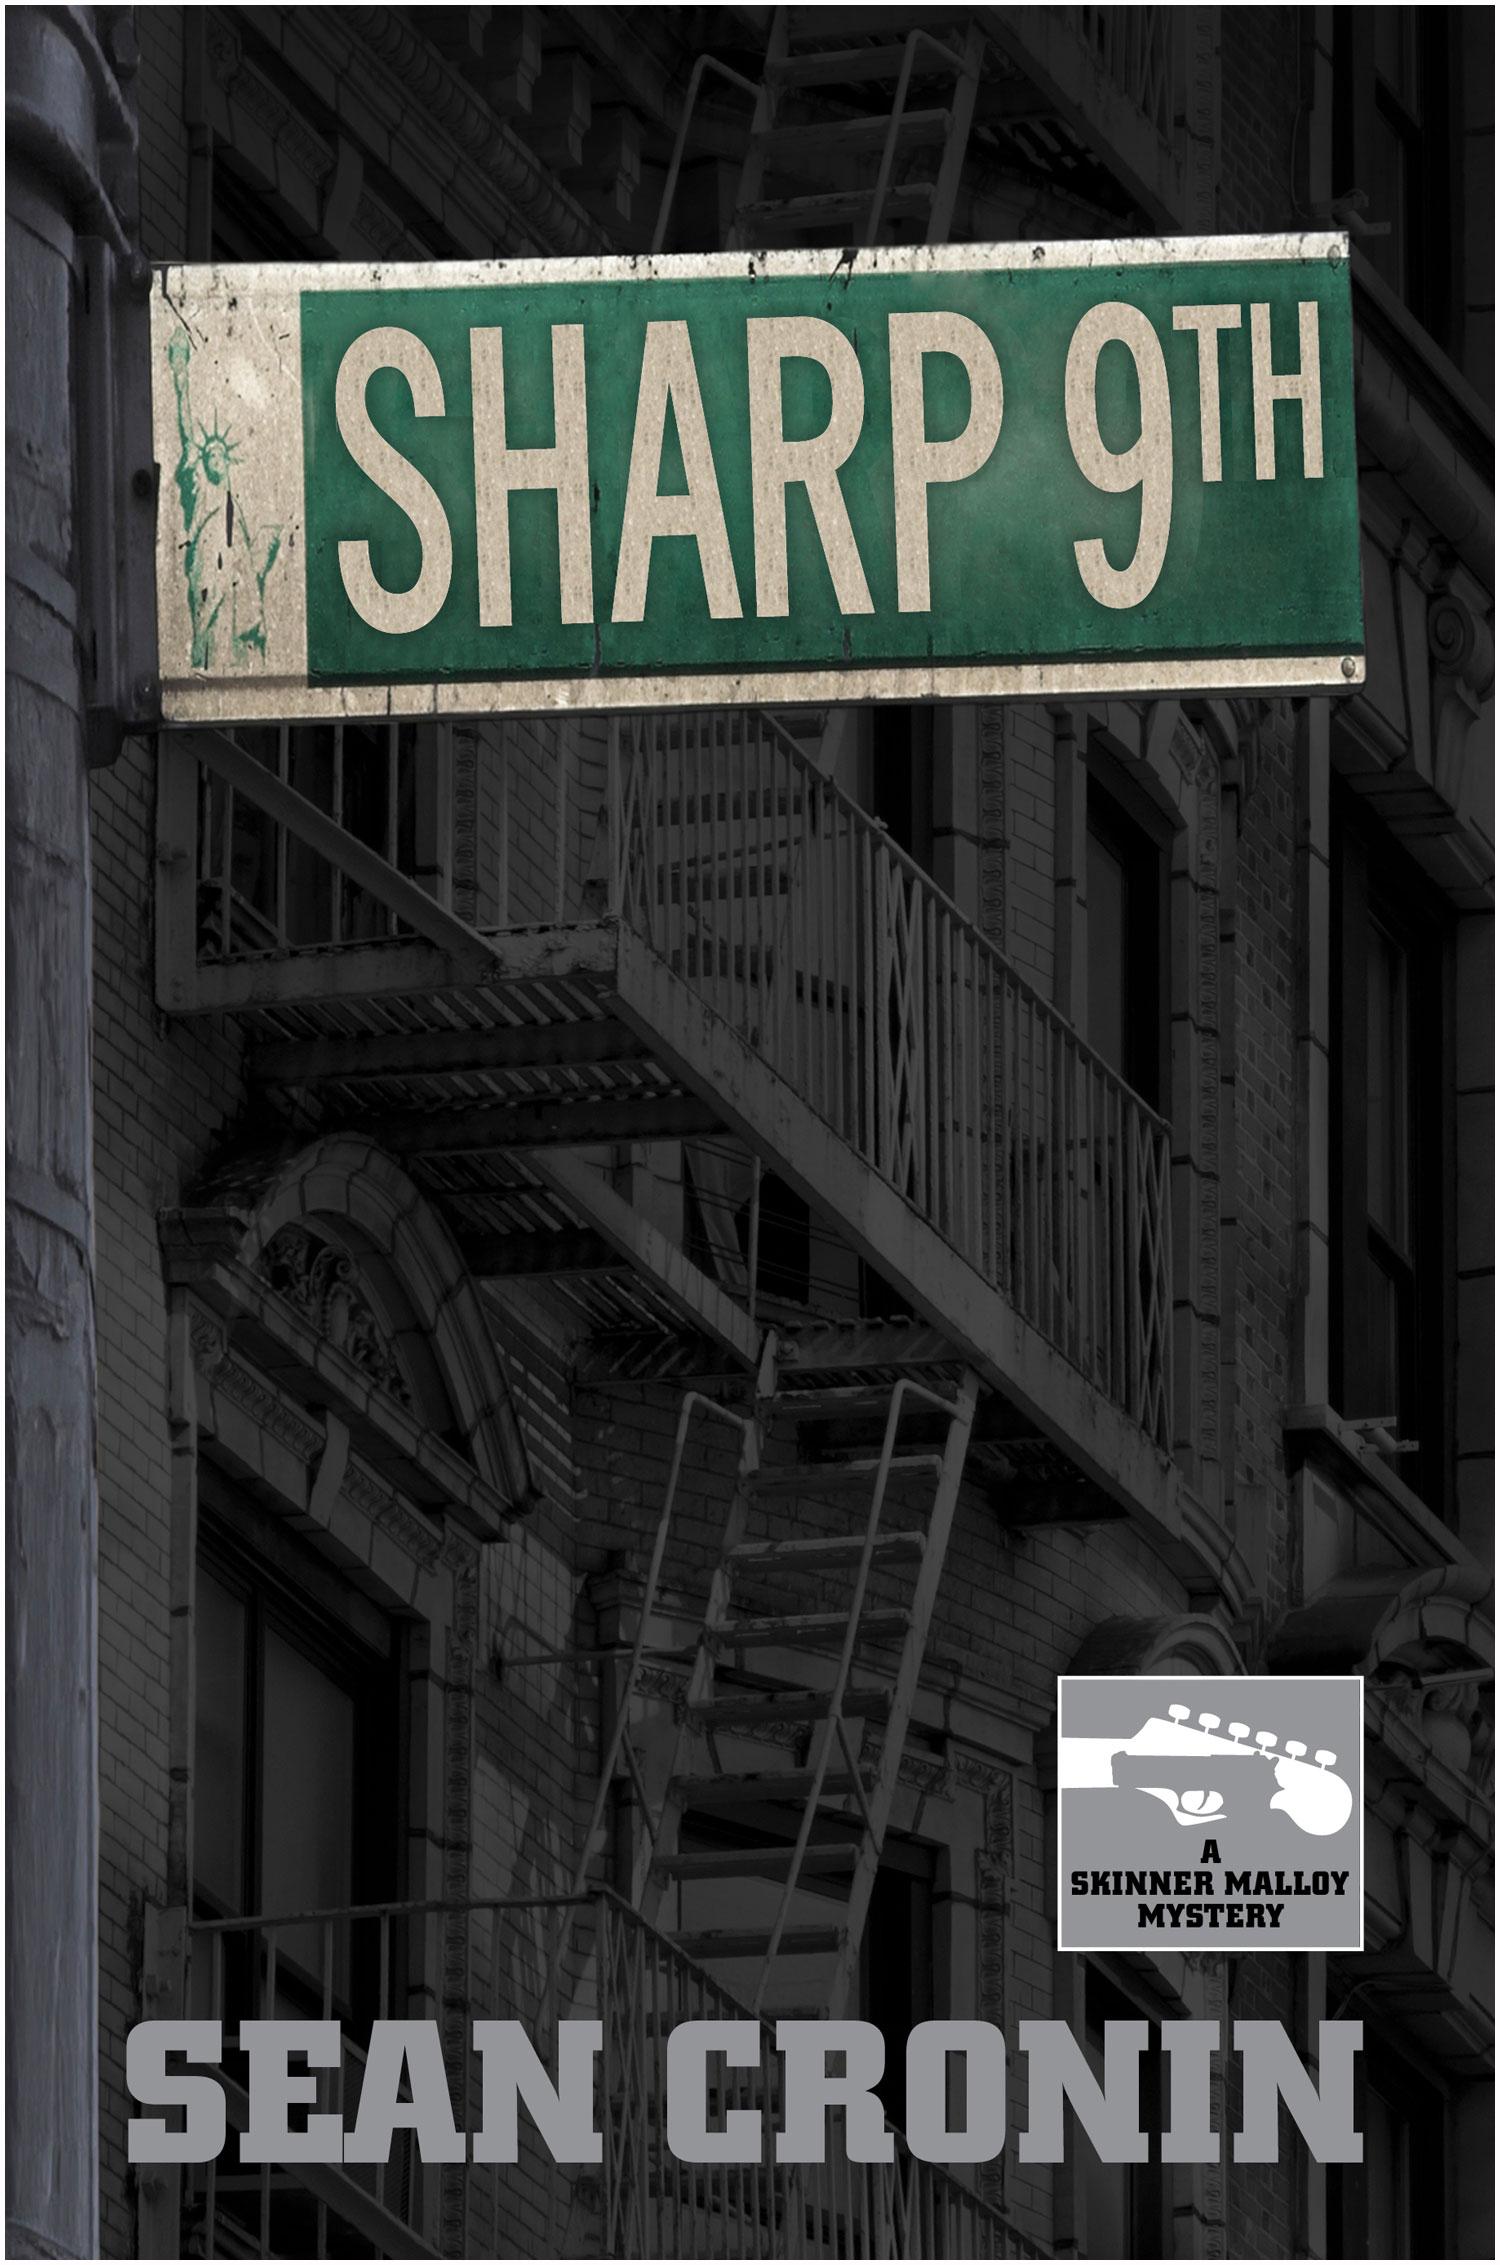 SHARP 9TH